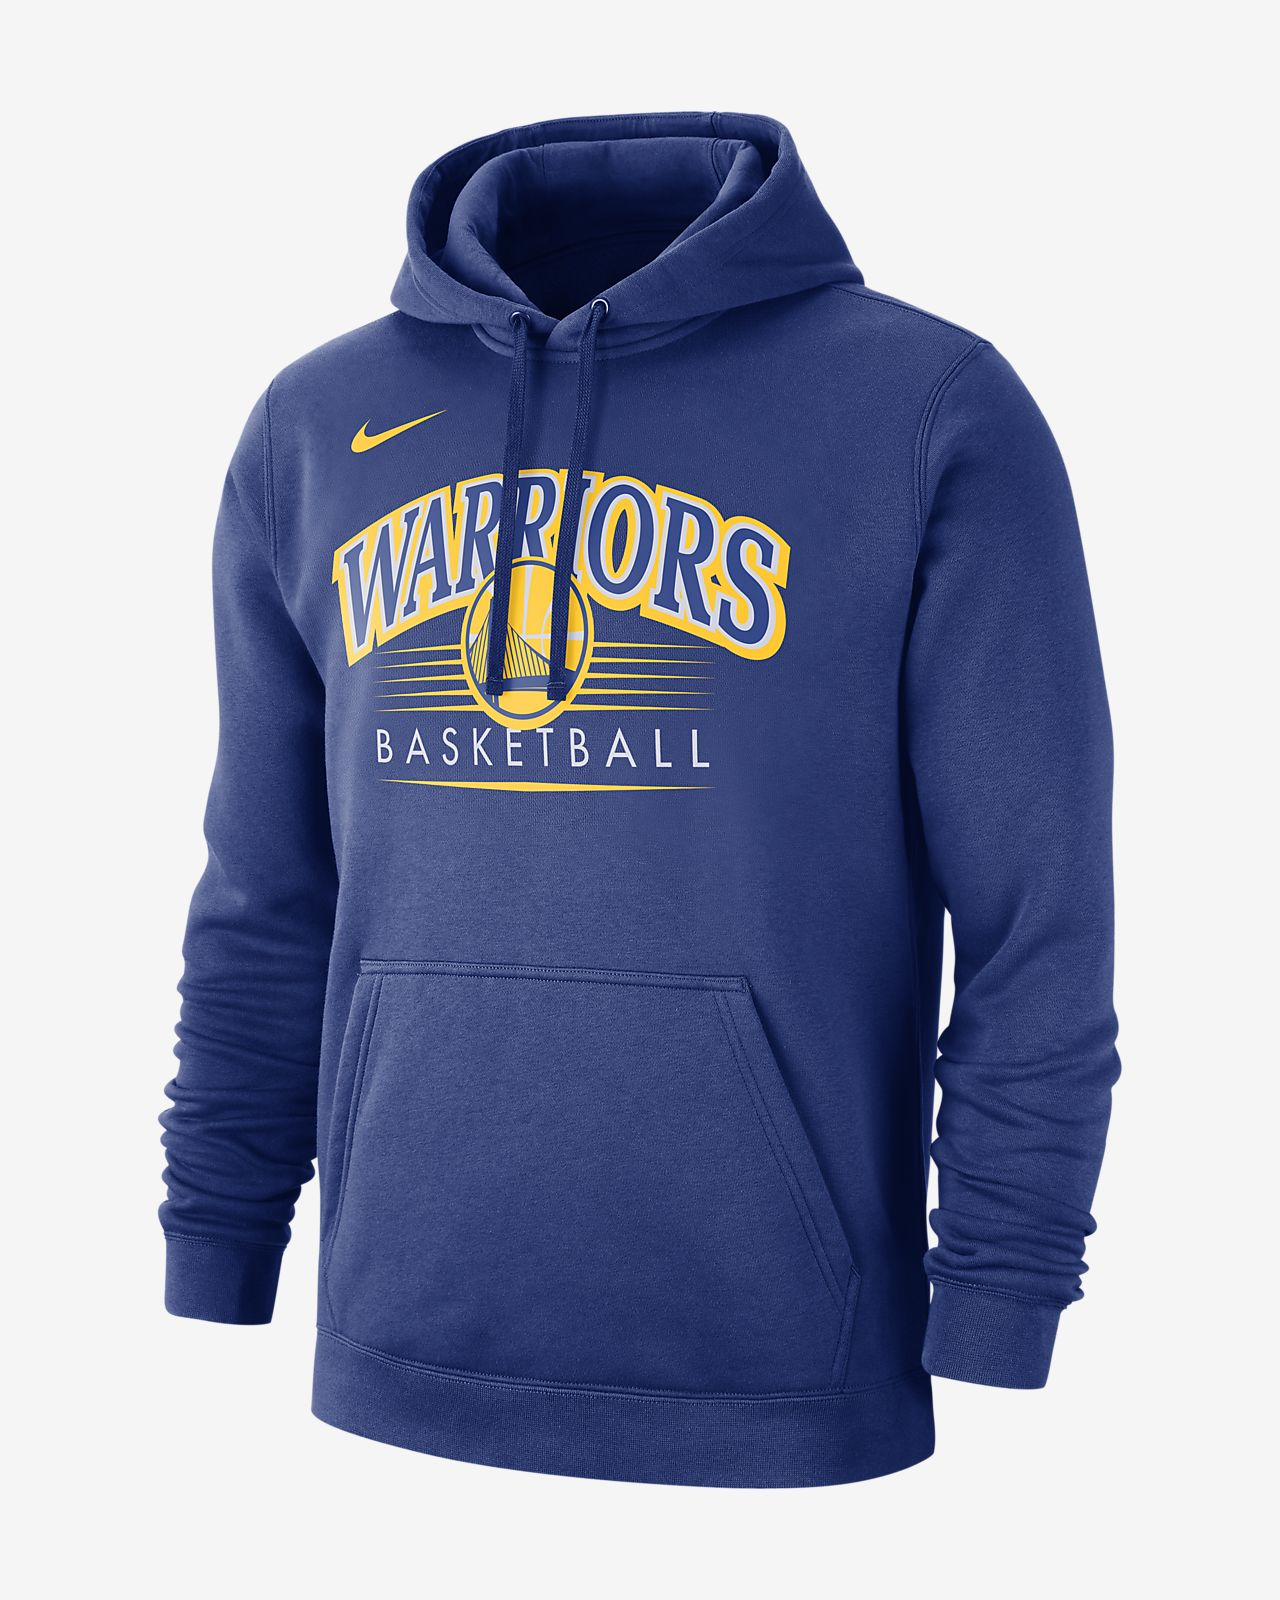 Golden State Warriors Nike NBA-Hoodie für Herren